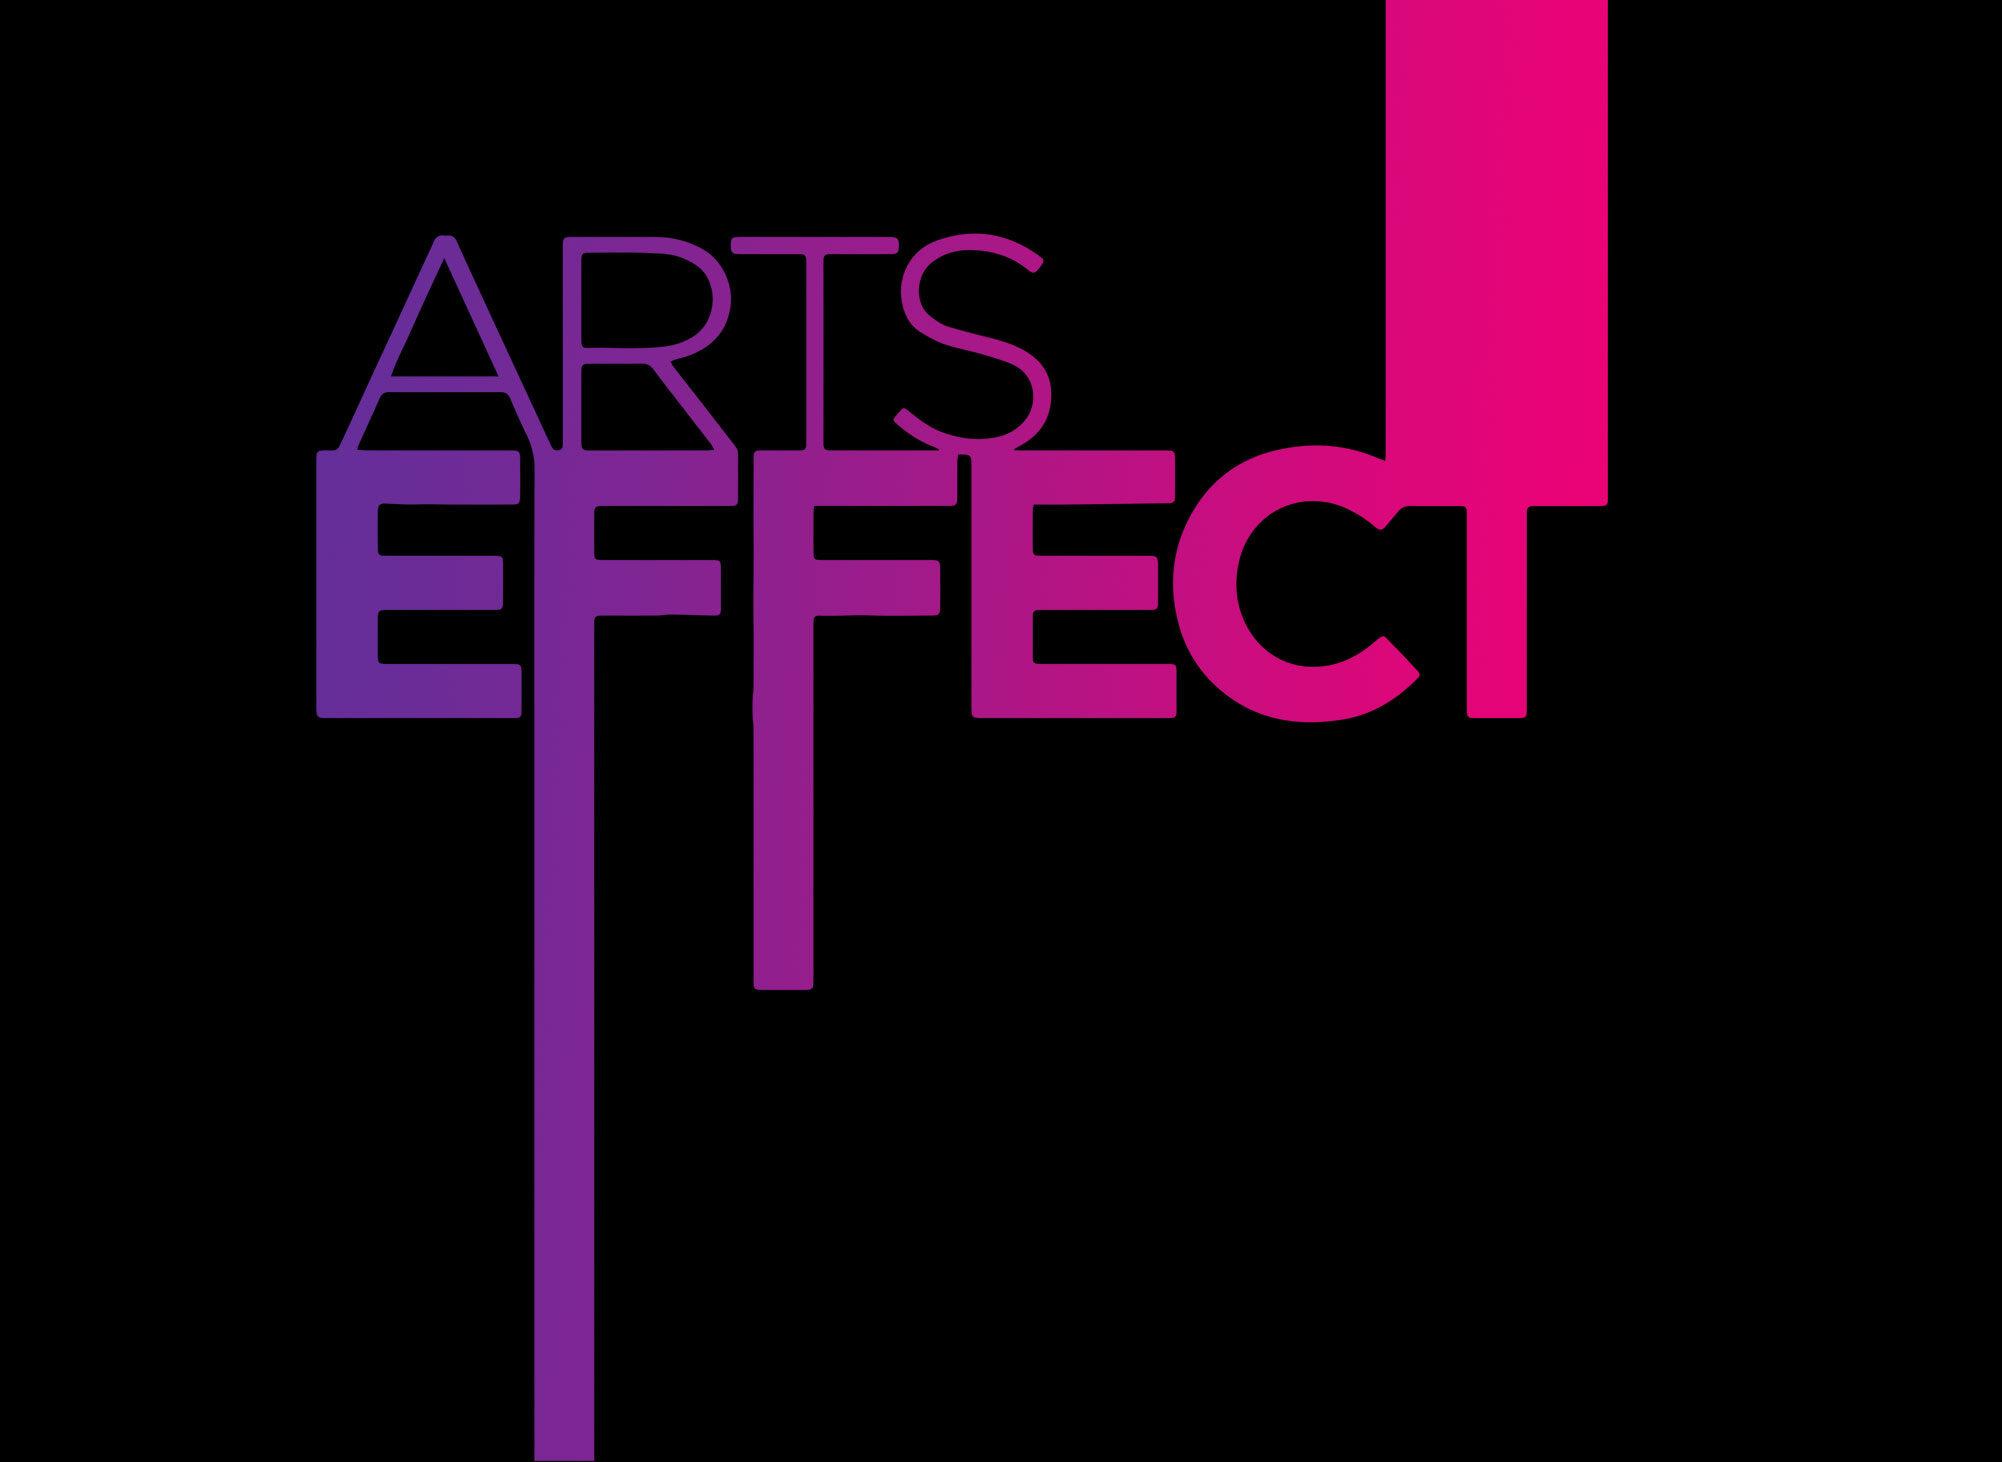 Arts-Effect-6-e1552078106930.jpg